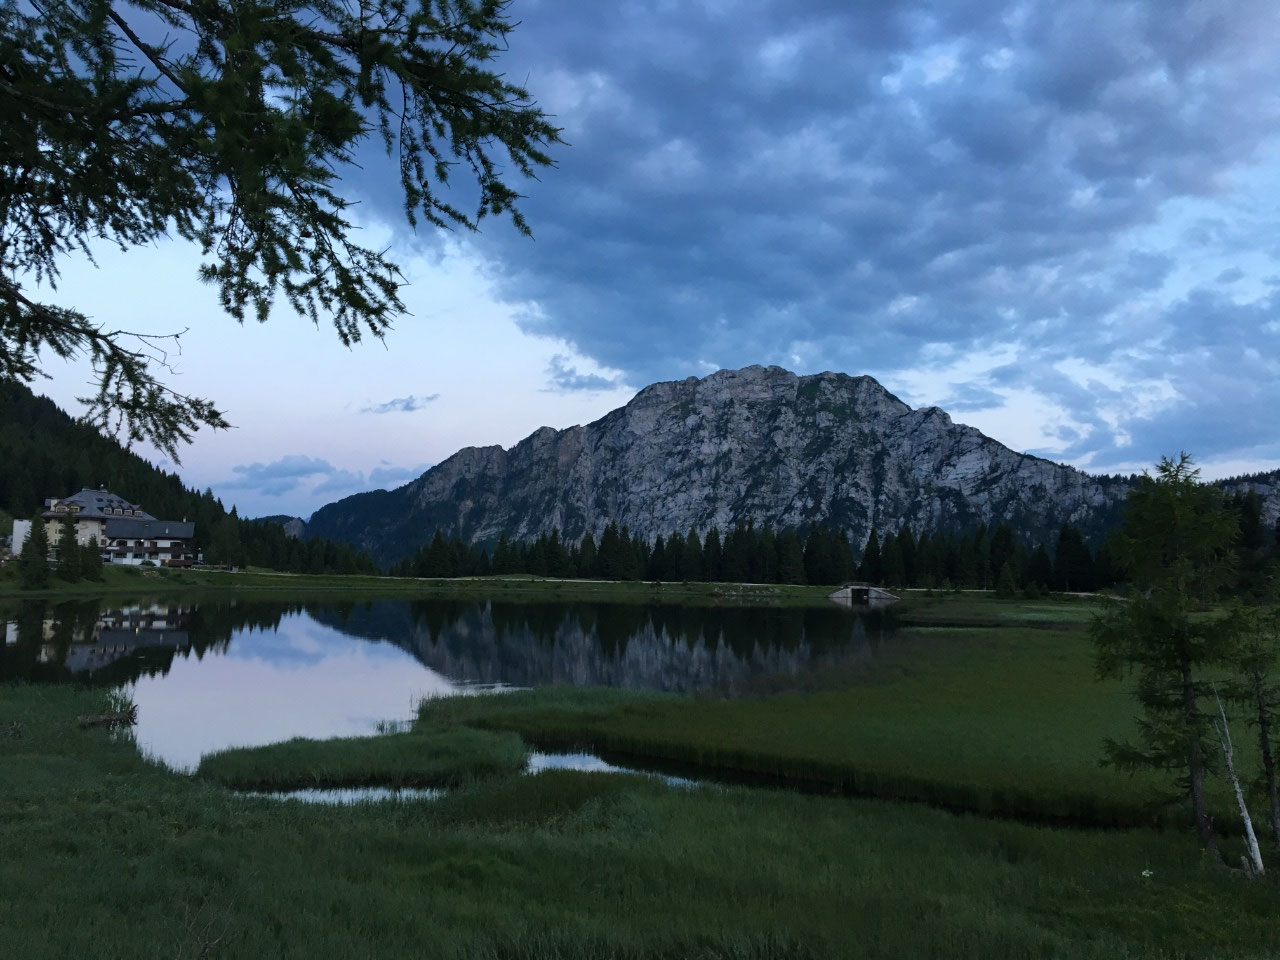 The Italian Alps are less green